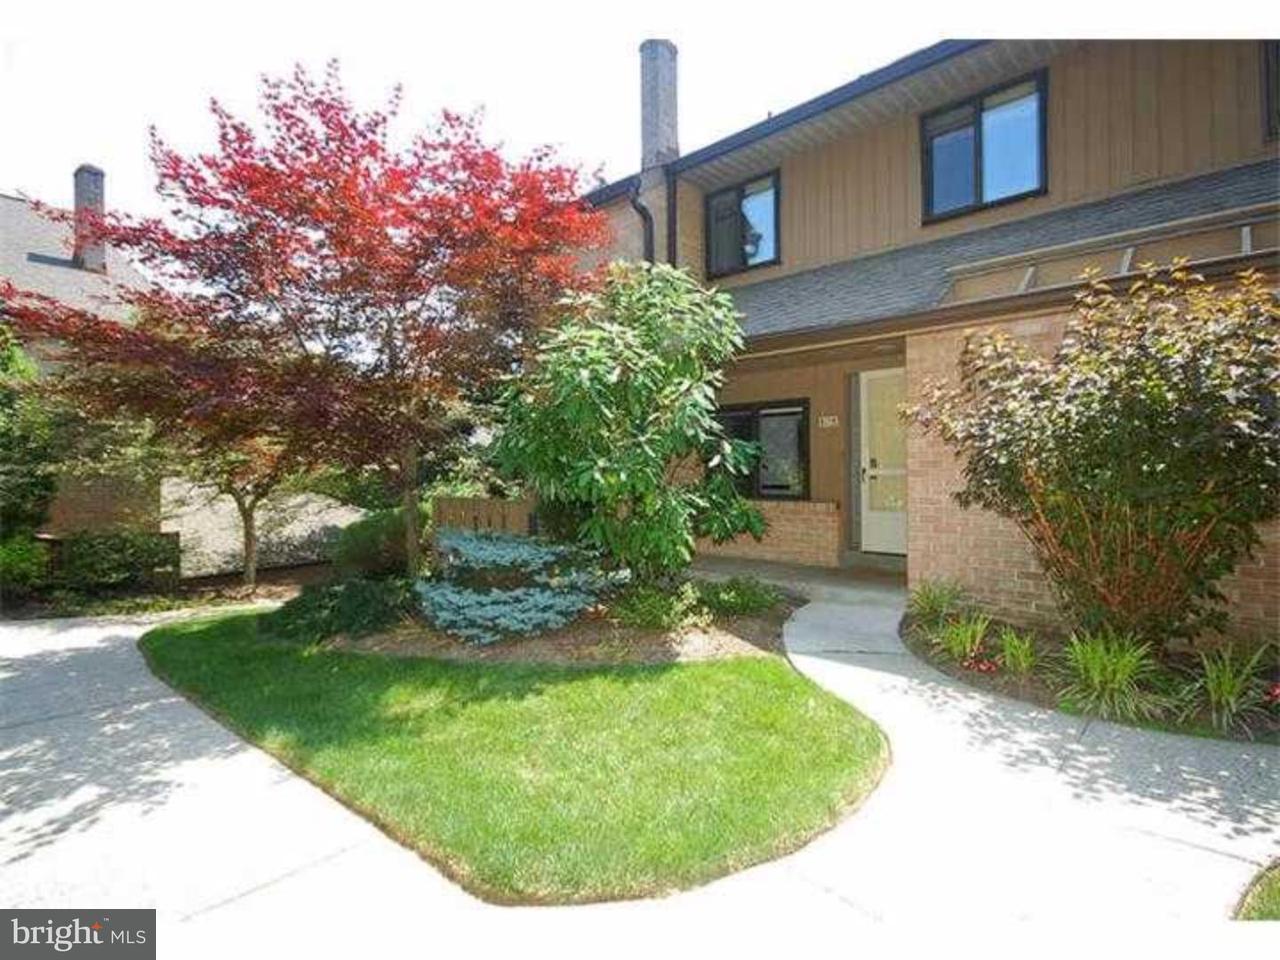 Condominium for Rent at 354 PAOLI WOODS Paoli, Pennsylvania 19301 United States